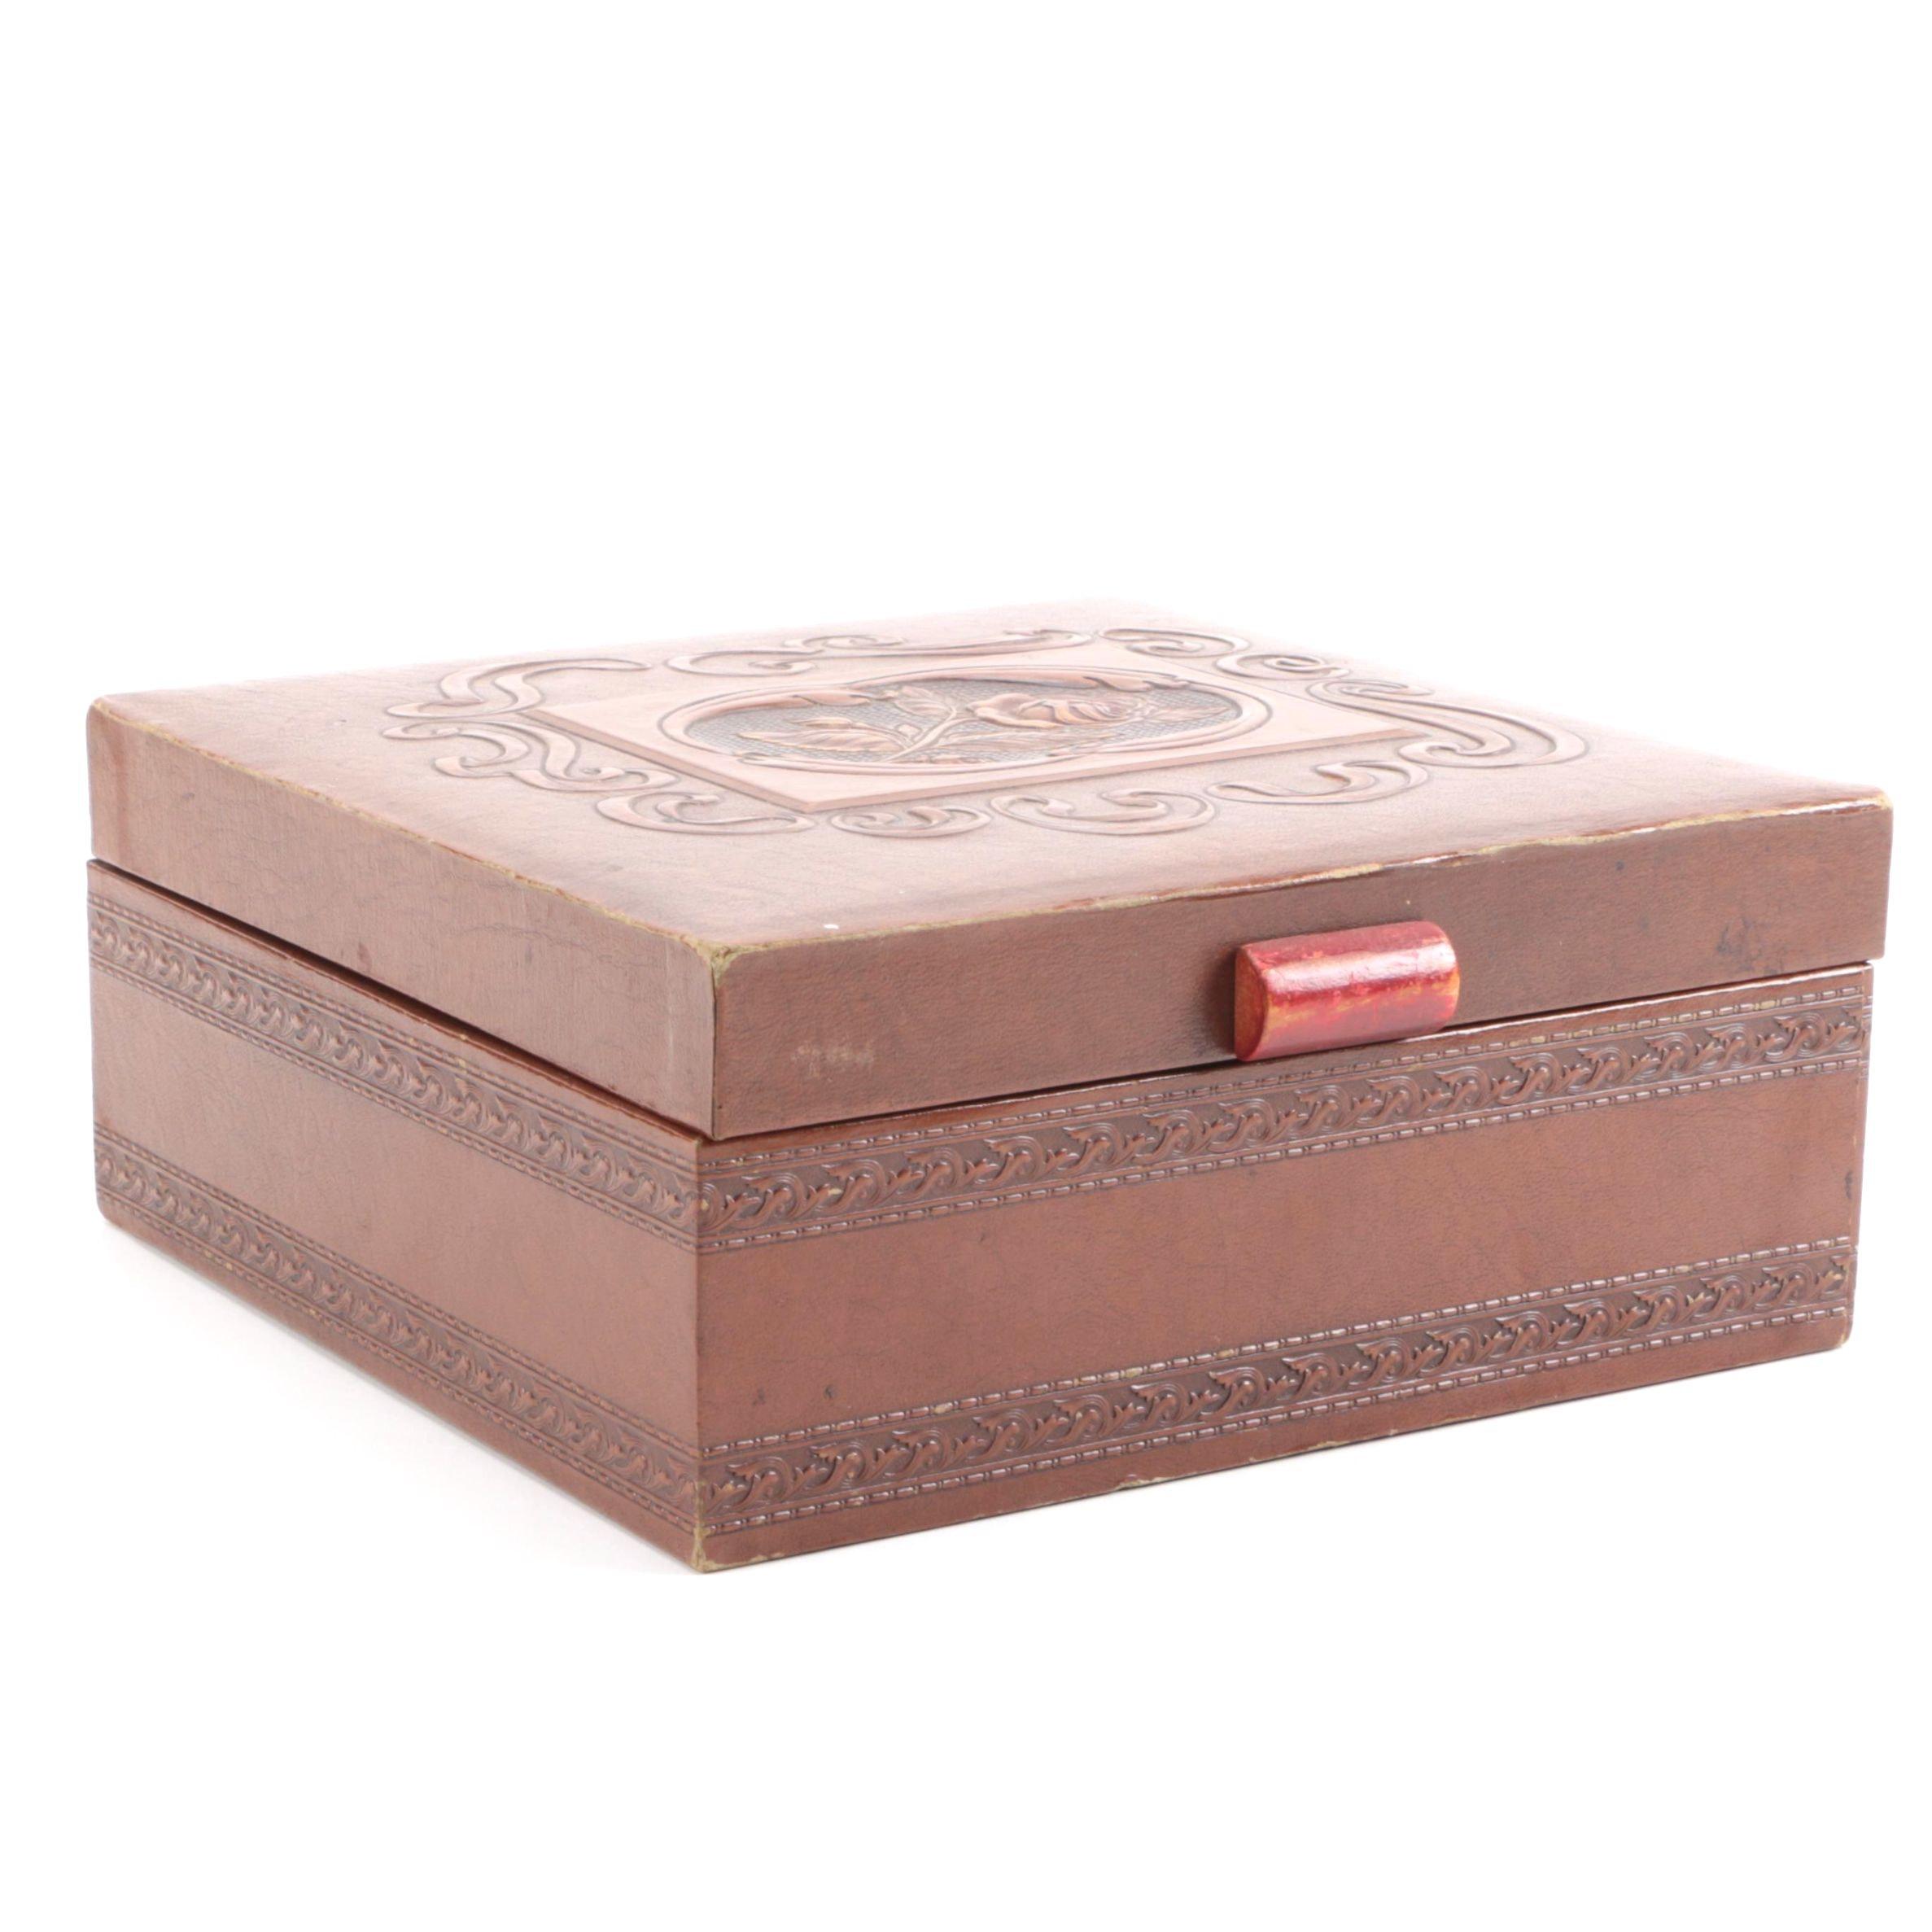 Vintage Jewelry Box With Bakelite Handle